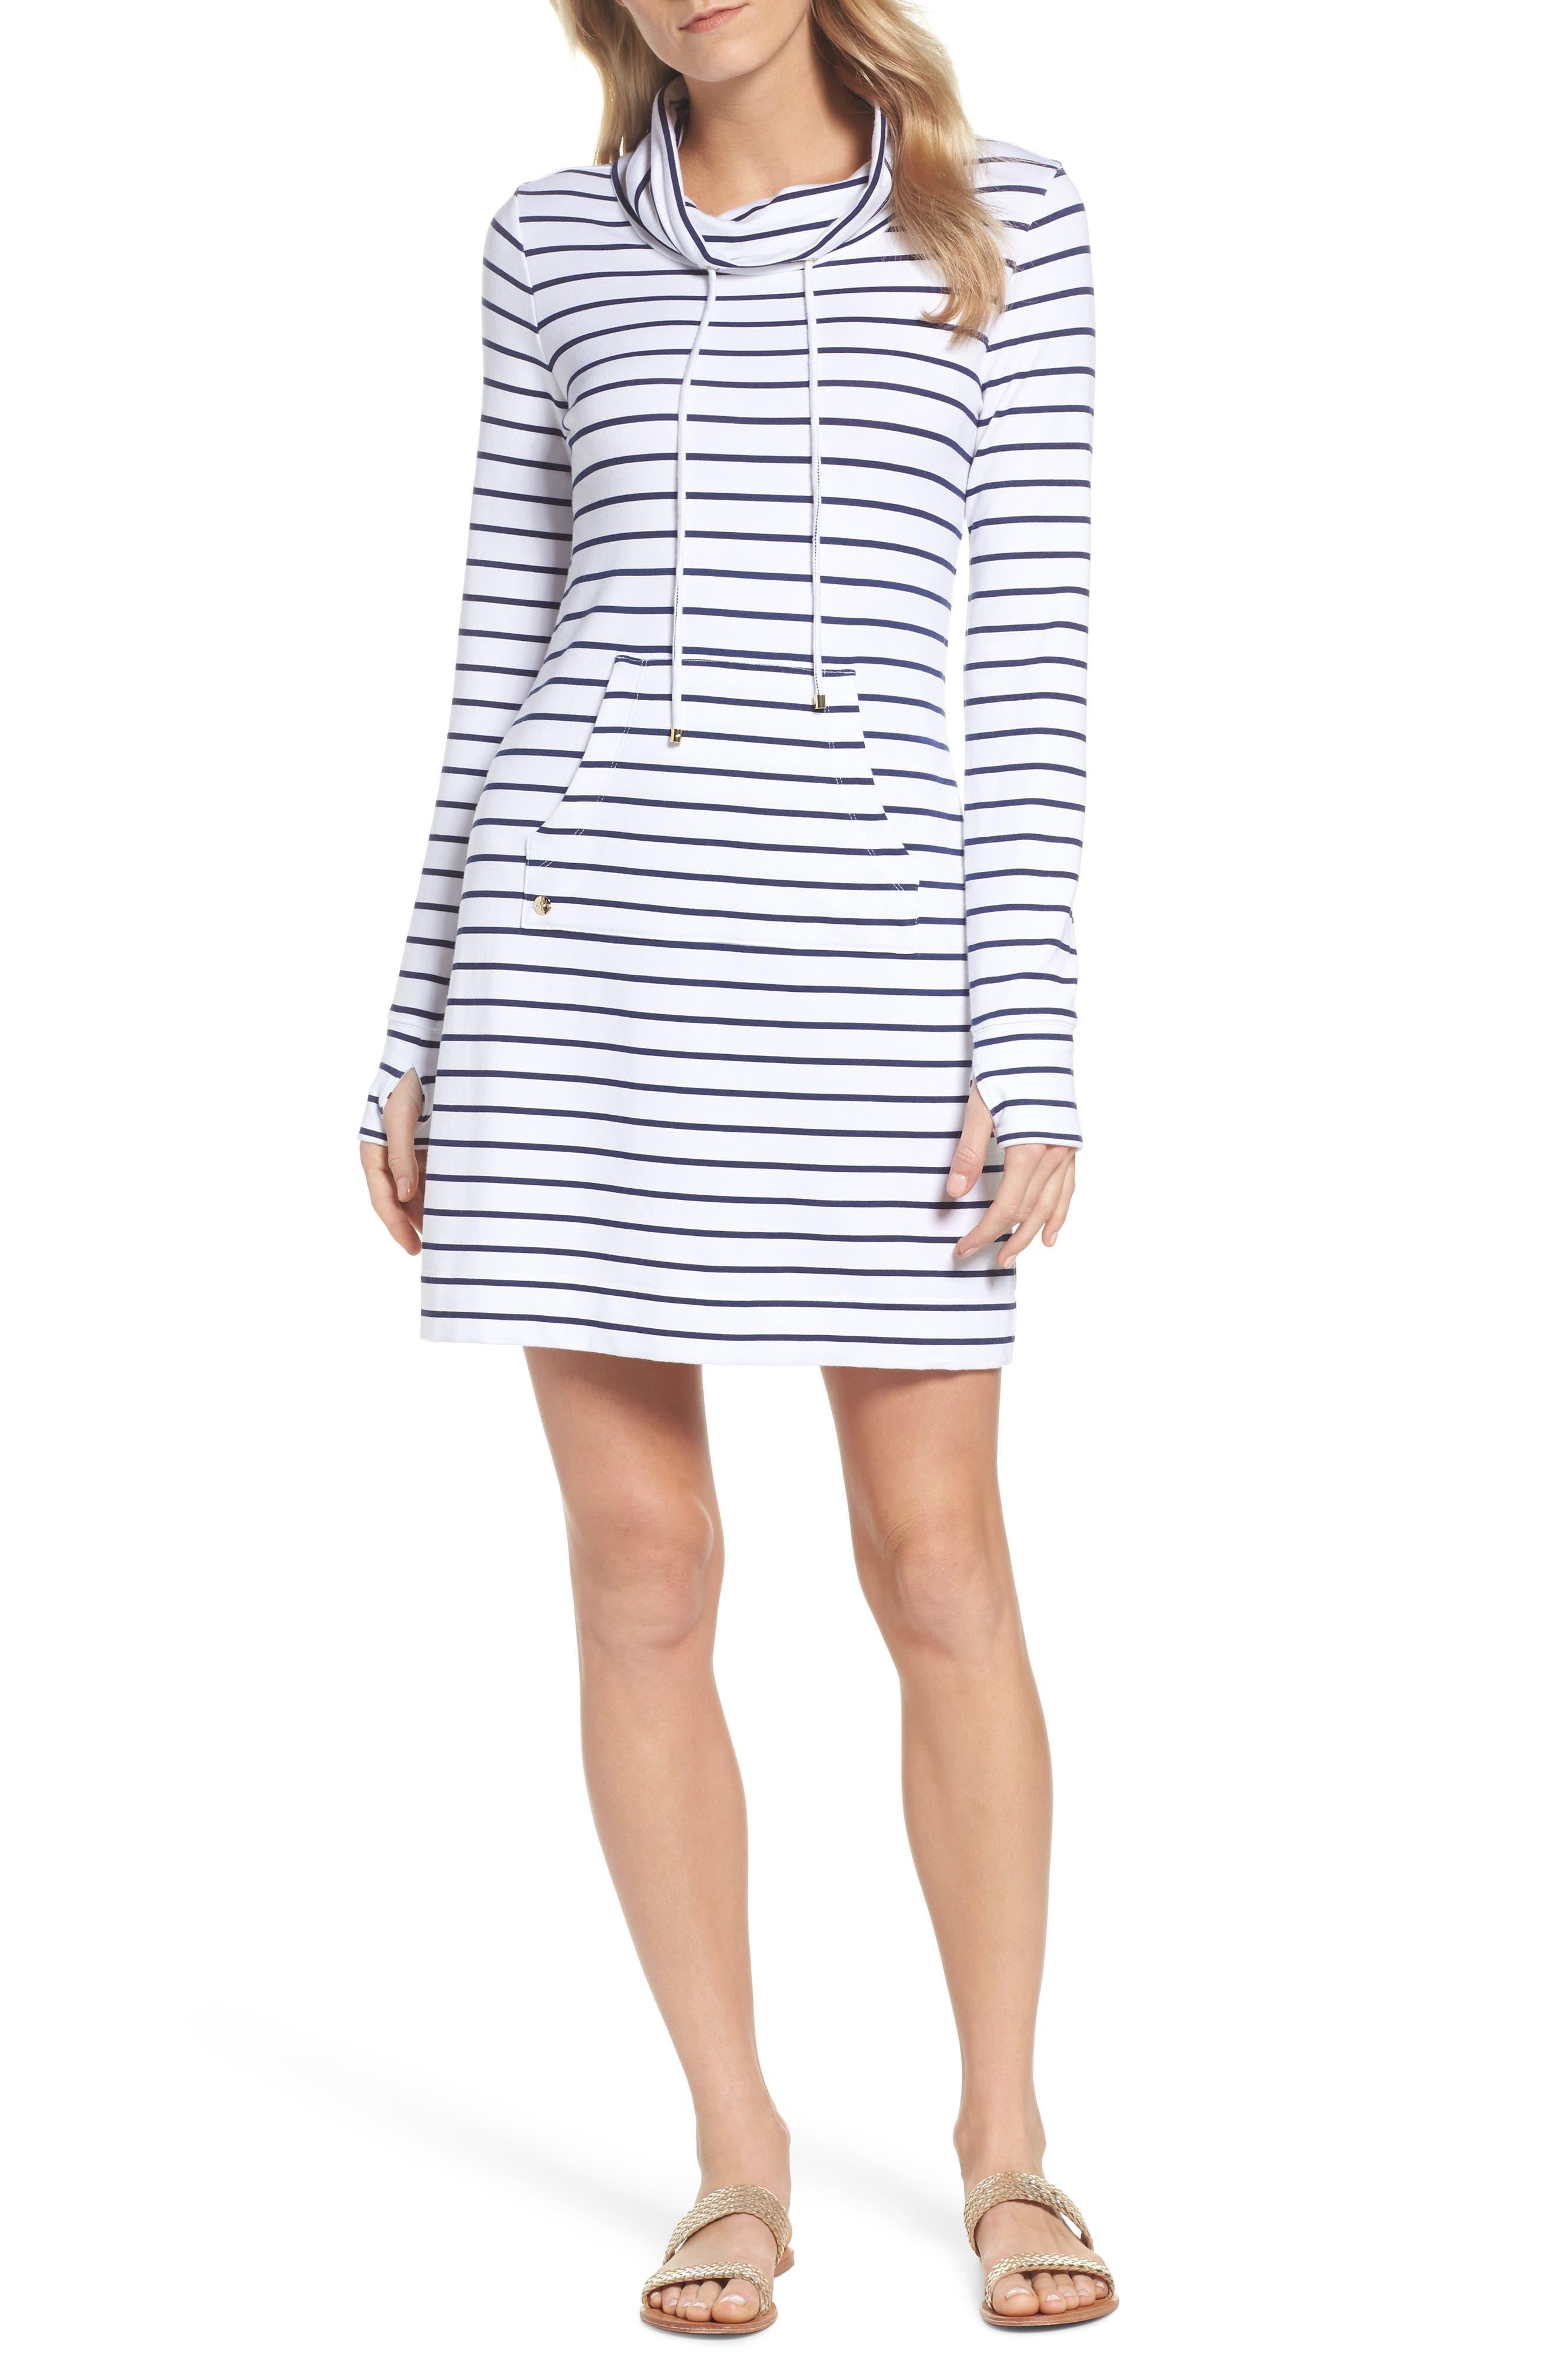 Hilary UPF 50+ Dress,                             Main thumbnail 1, color,